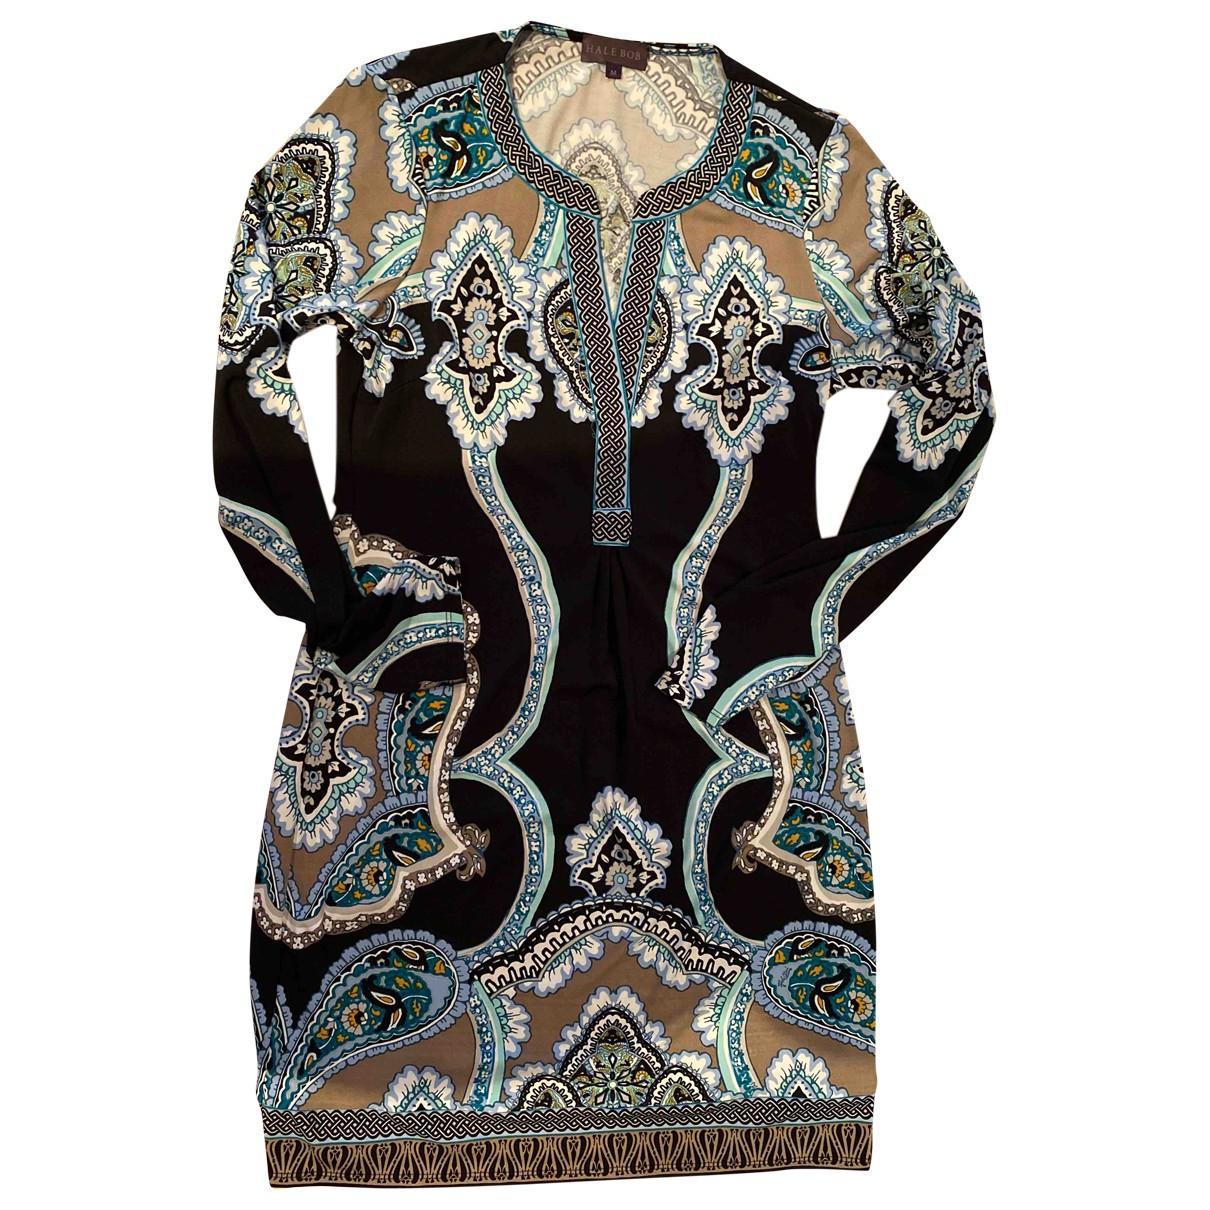 Hale Bob \N Black dress for Women M International